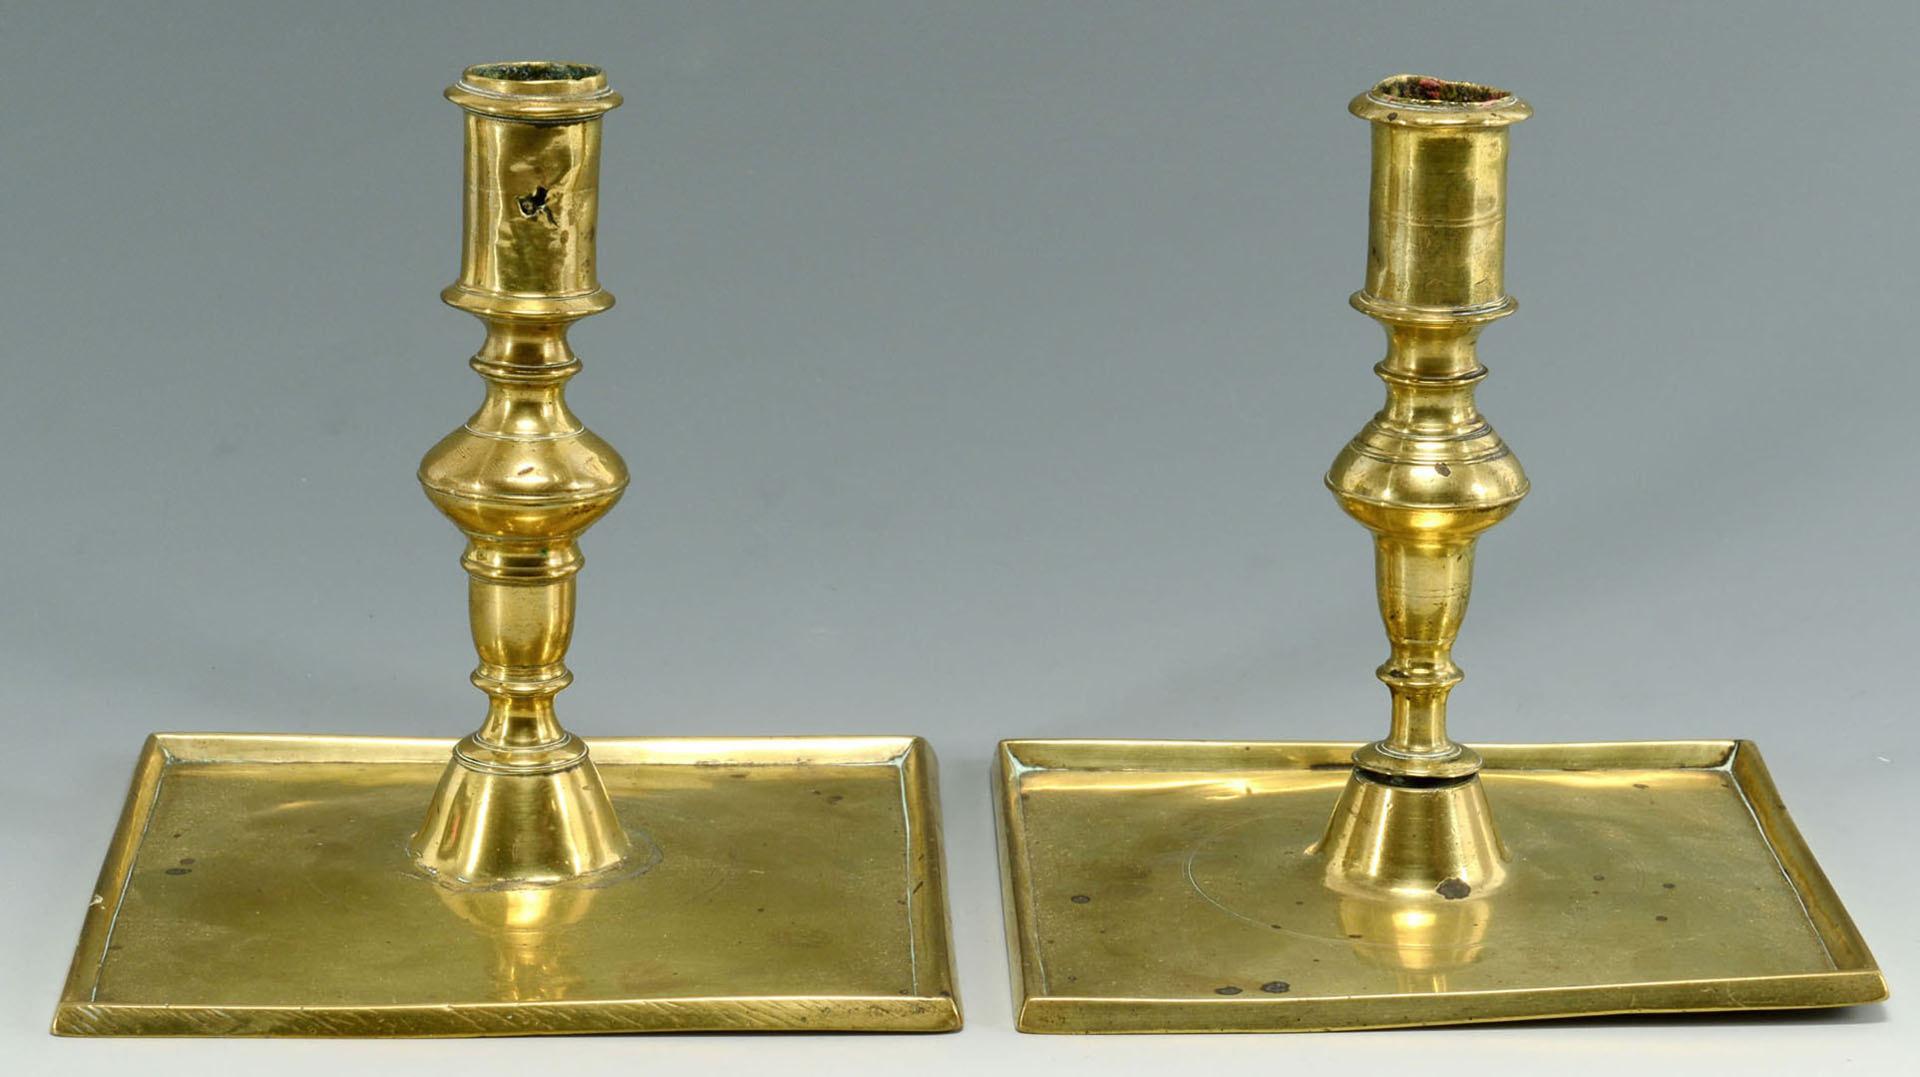 Lot 92: Four Similar 17th c. Brass Candlesticks